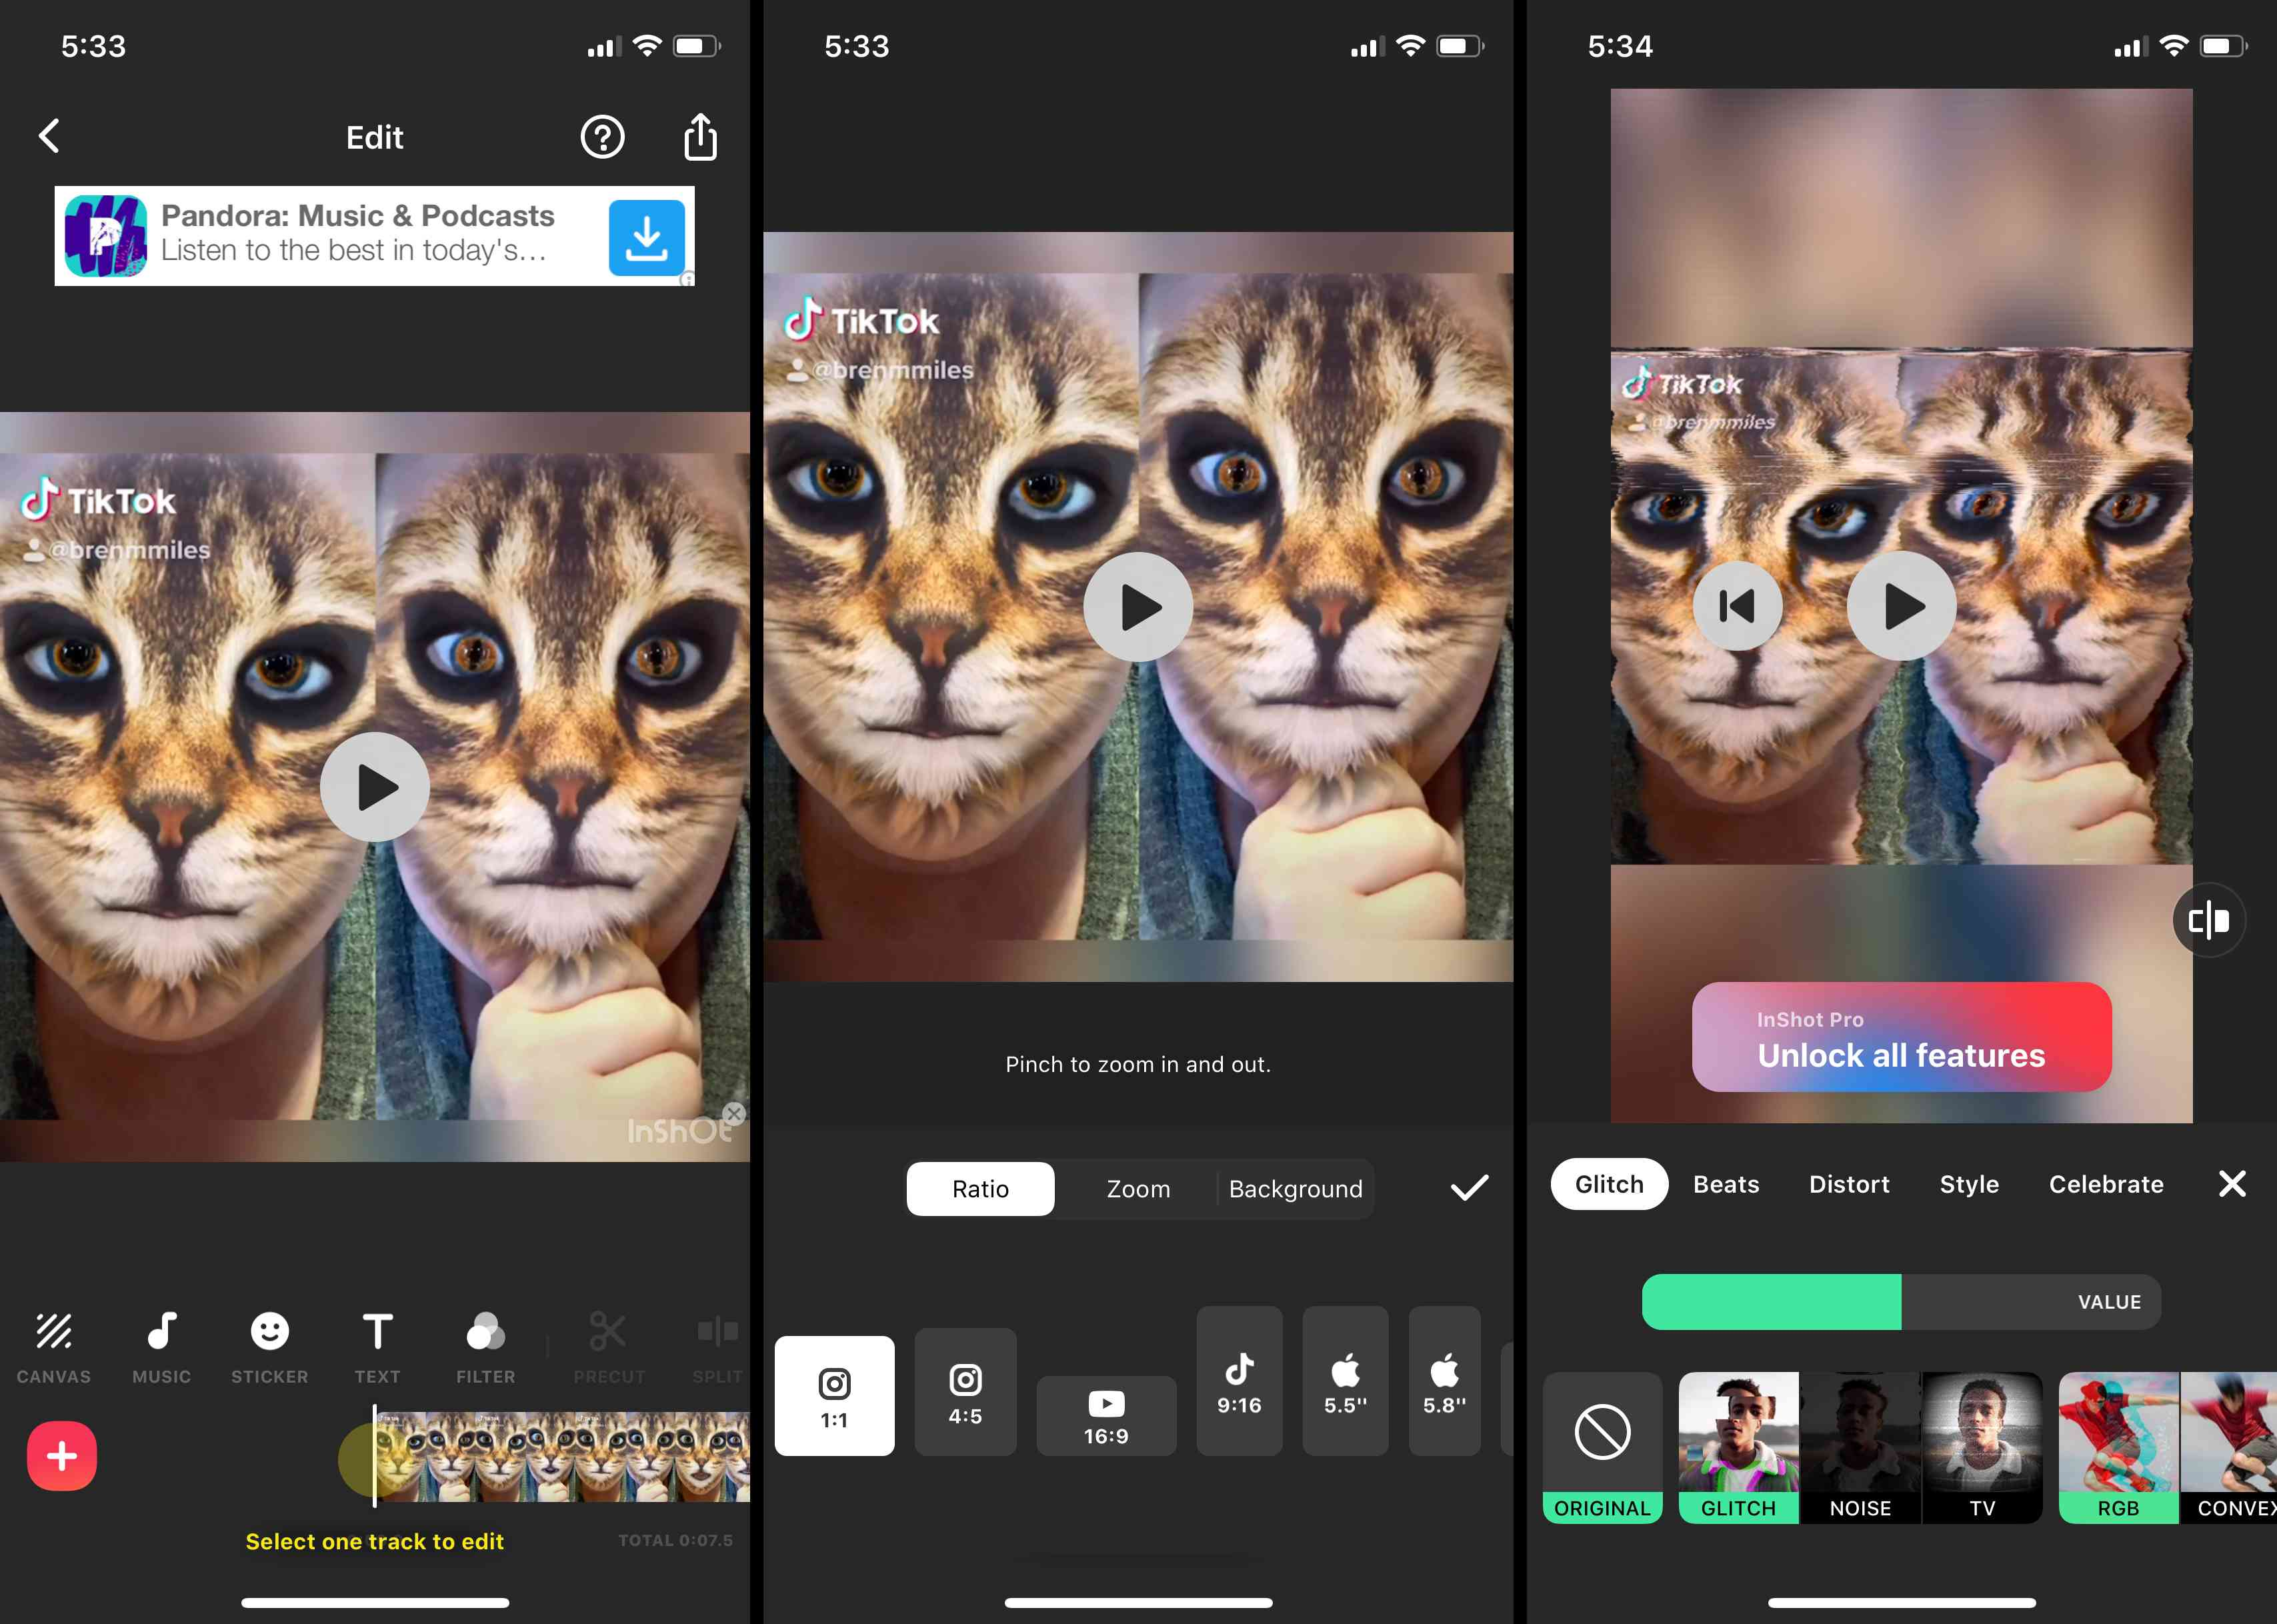 Screenshots of the InShot app.